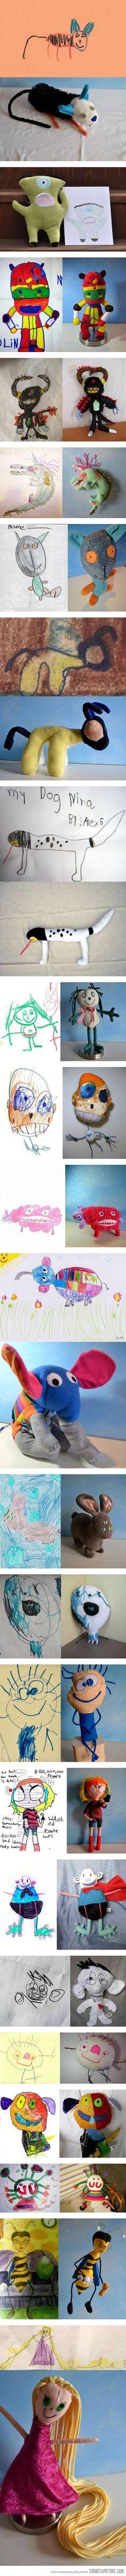 Bring Children's artworks to life